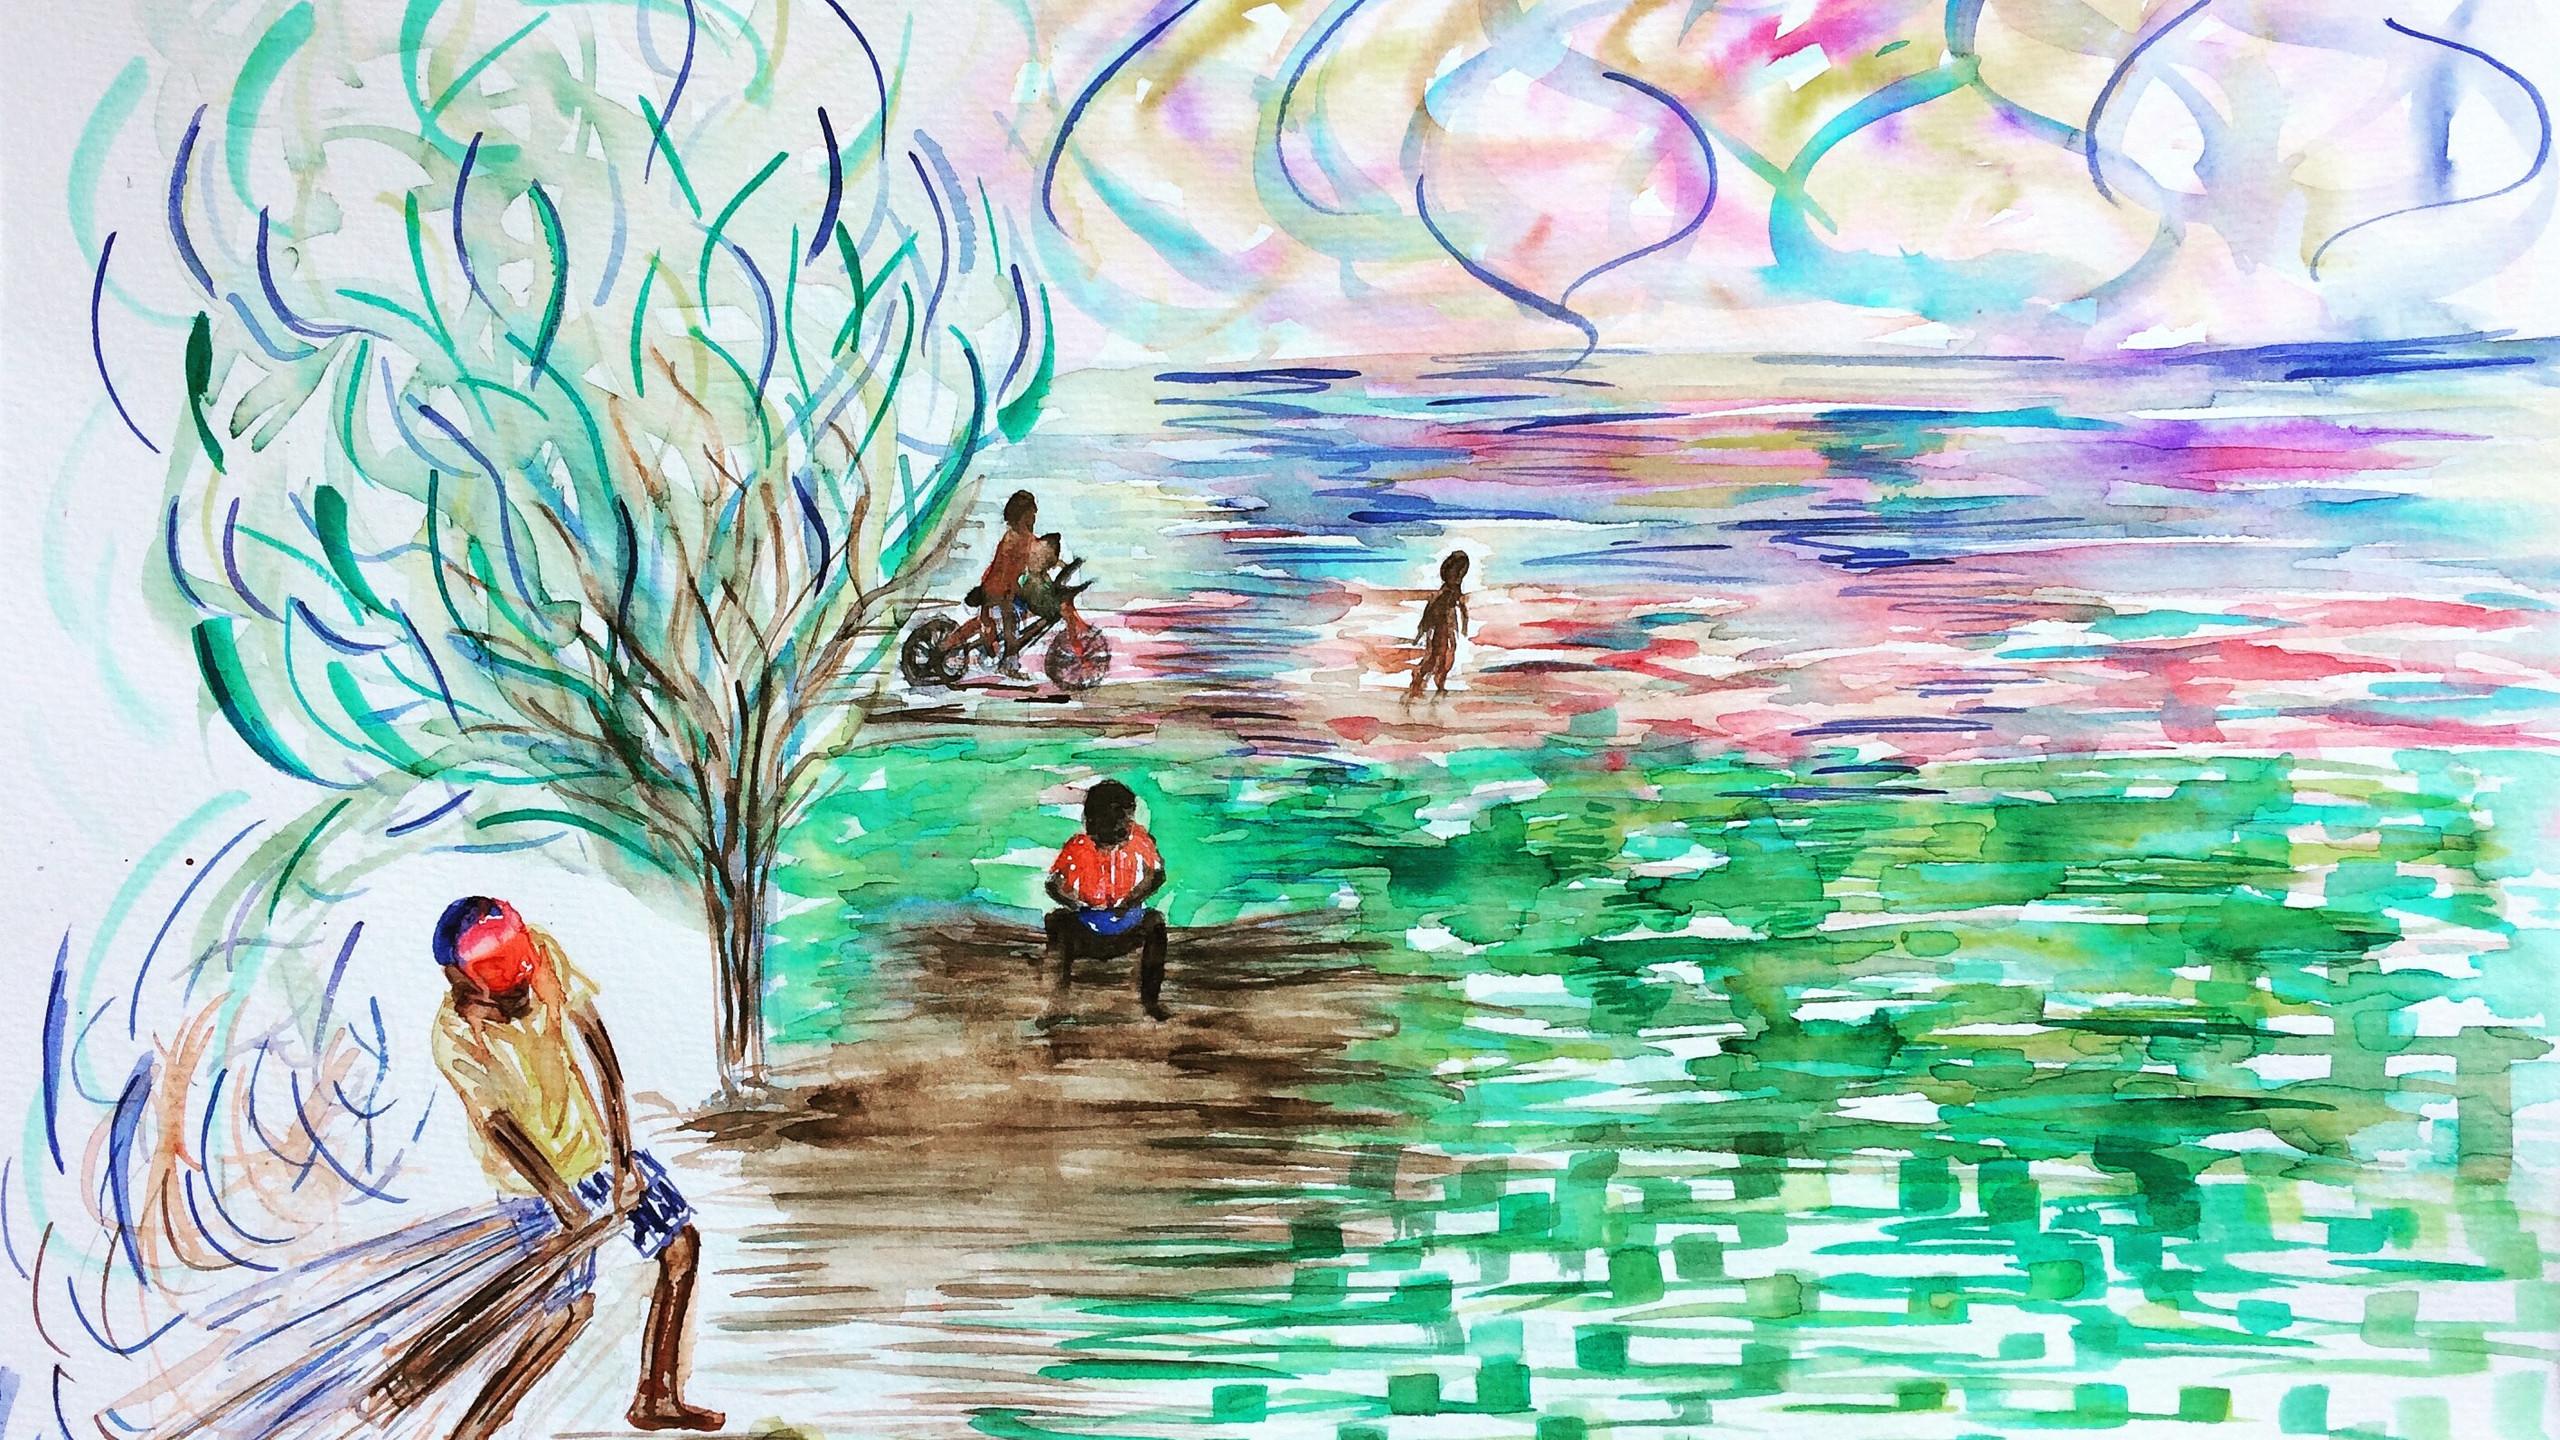 47 x 38 cms  Watercolor